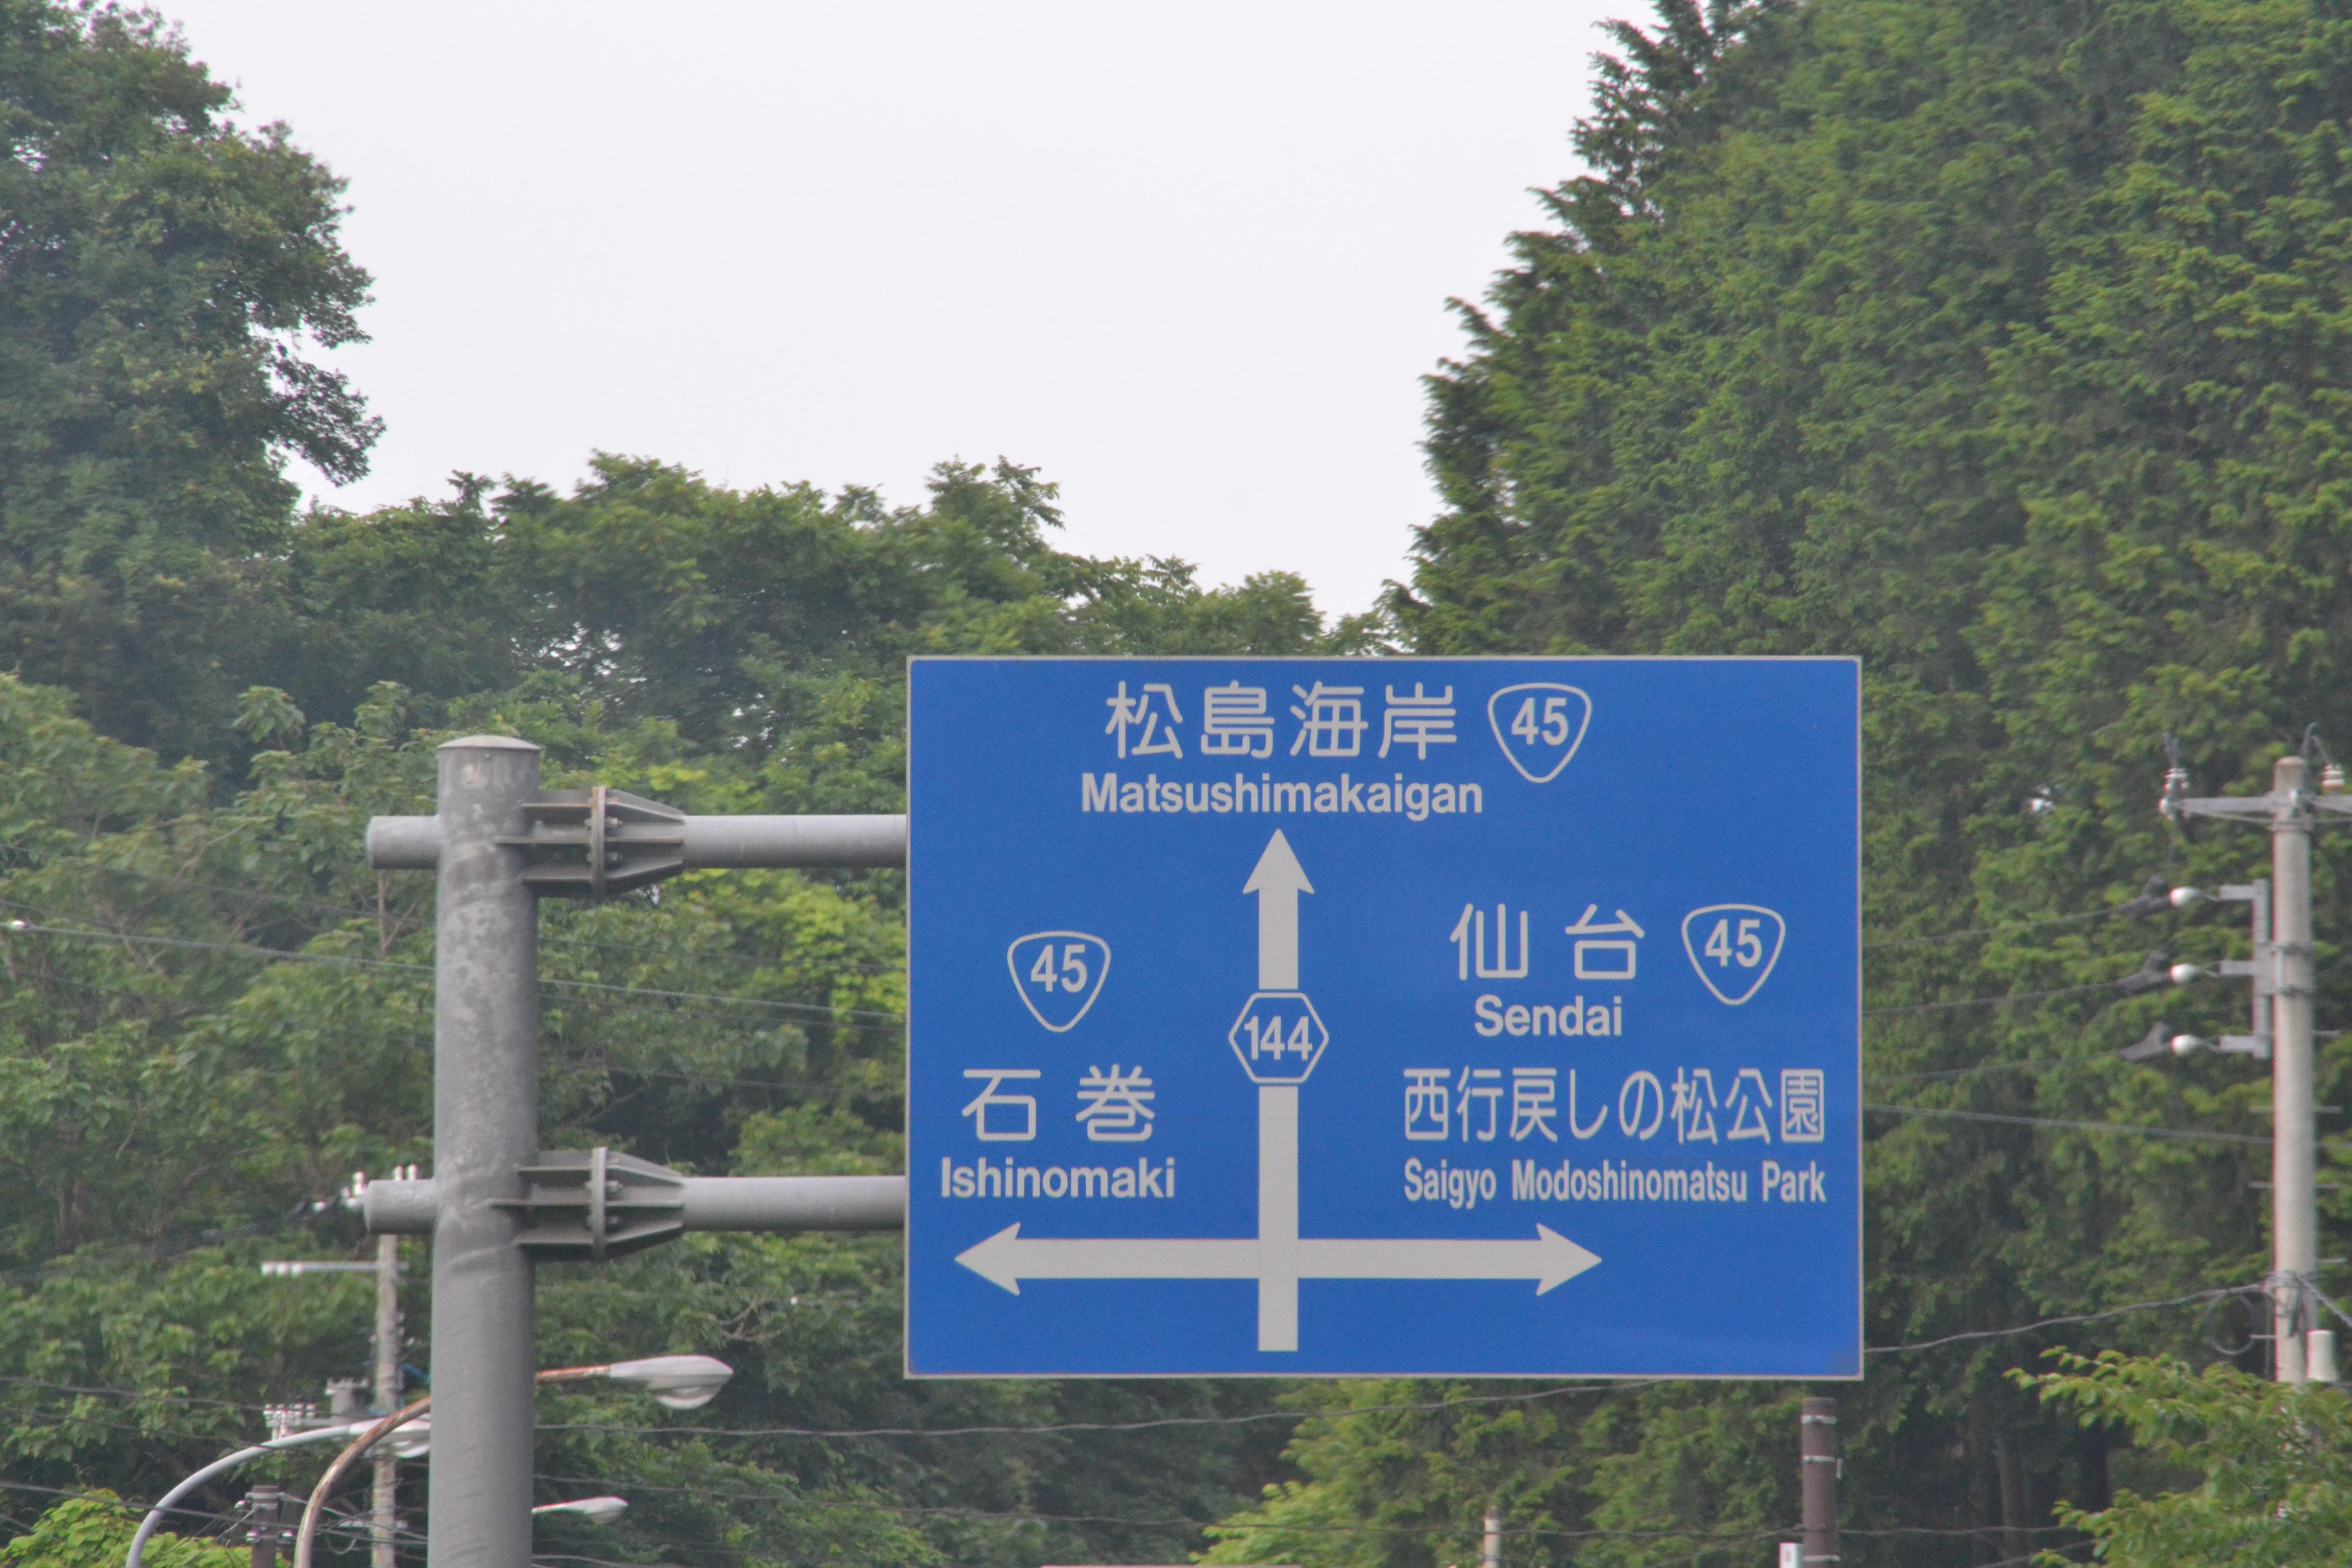 sendai roadsign to matsushima.JPG